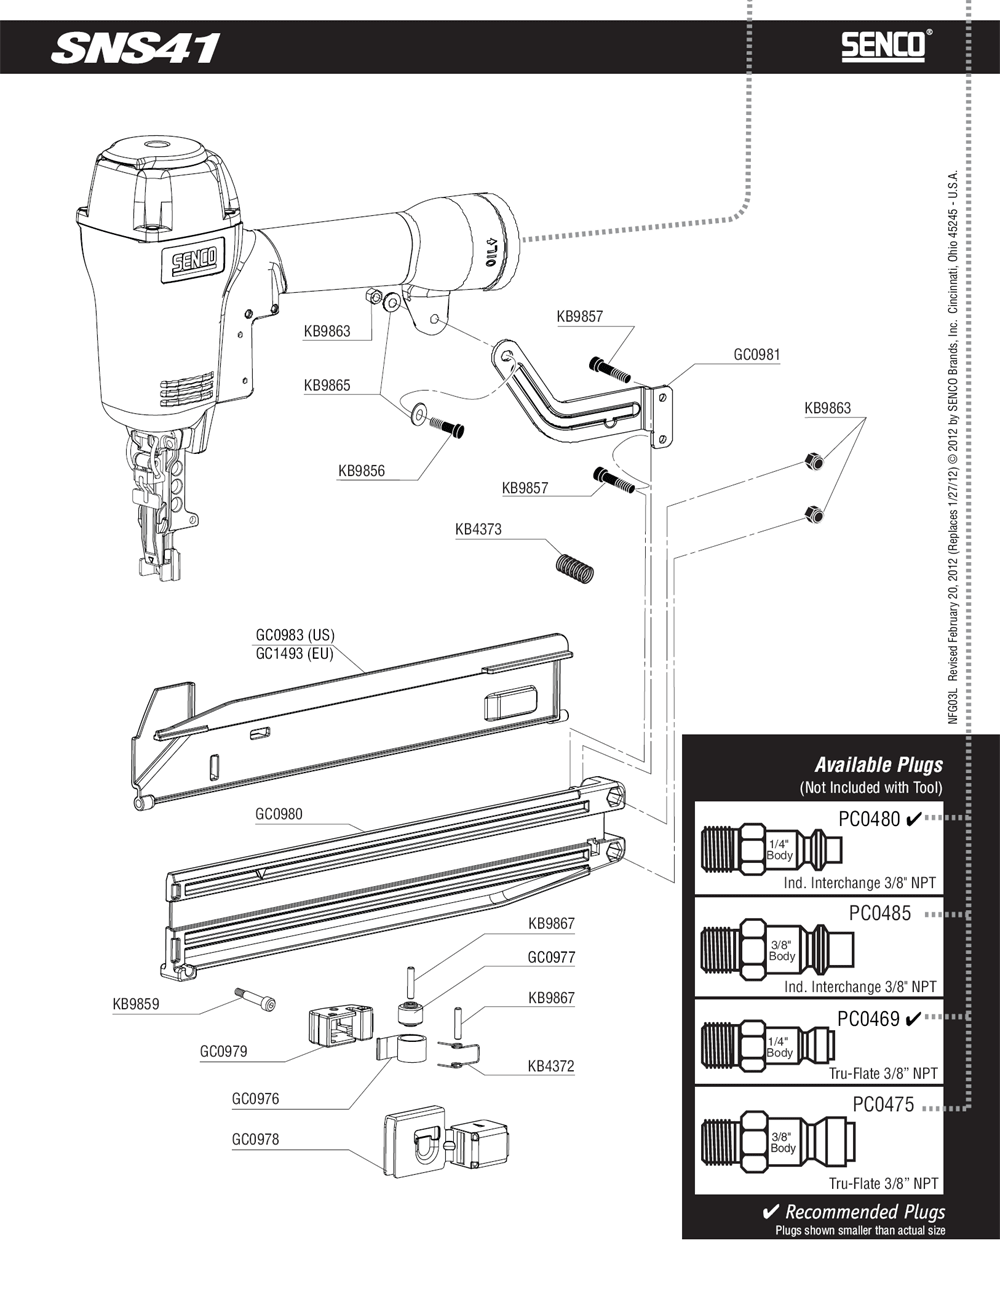 3L0003N-senco-PB-1Break Down